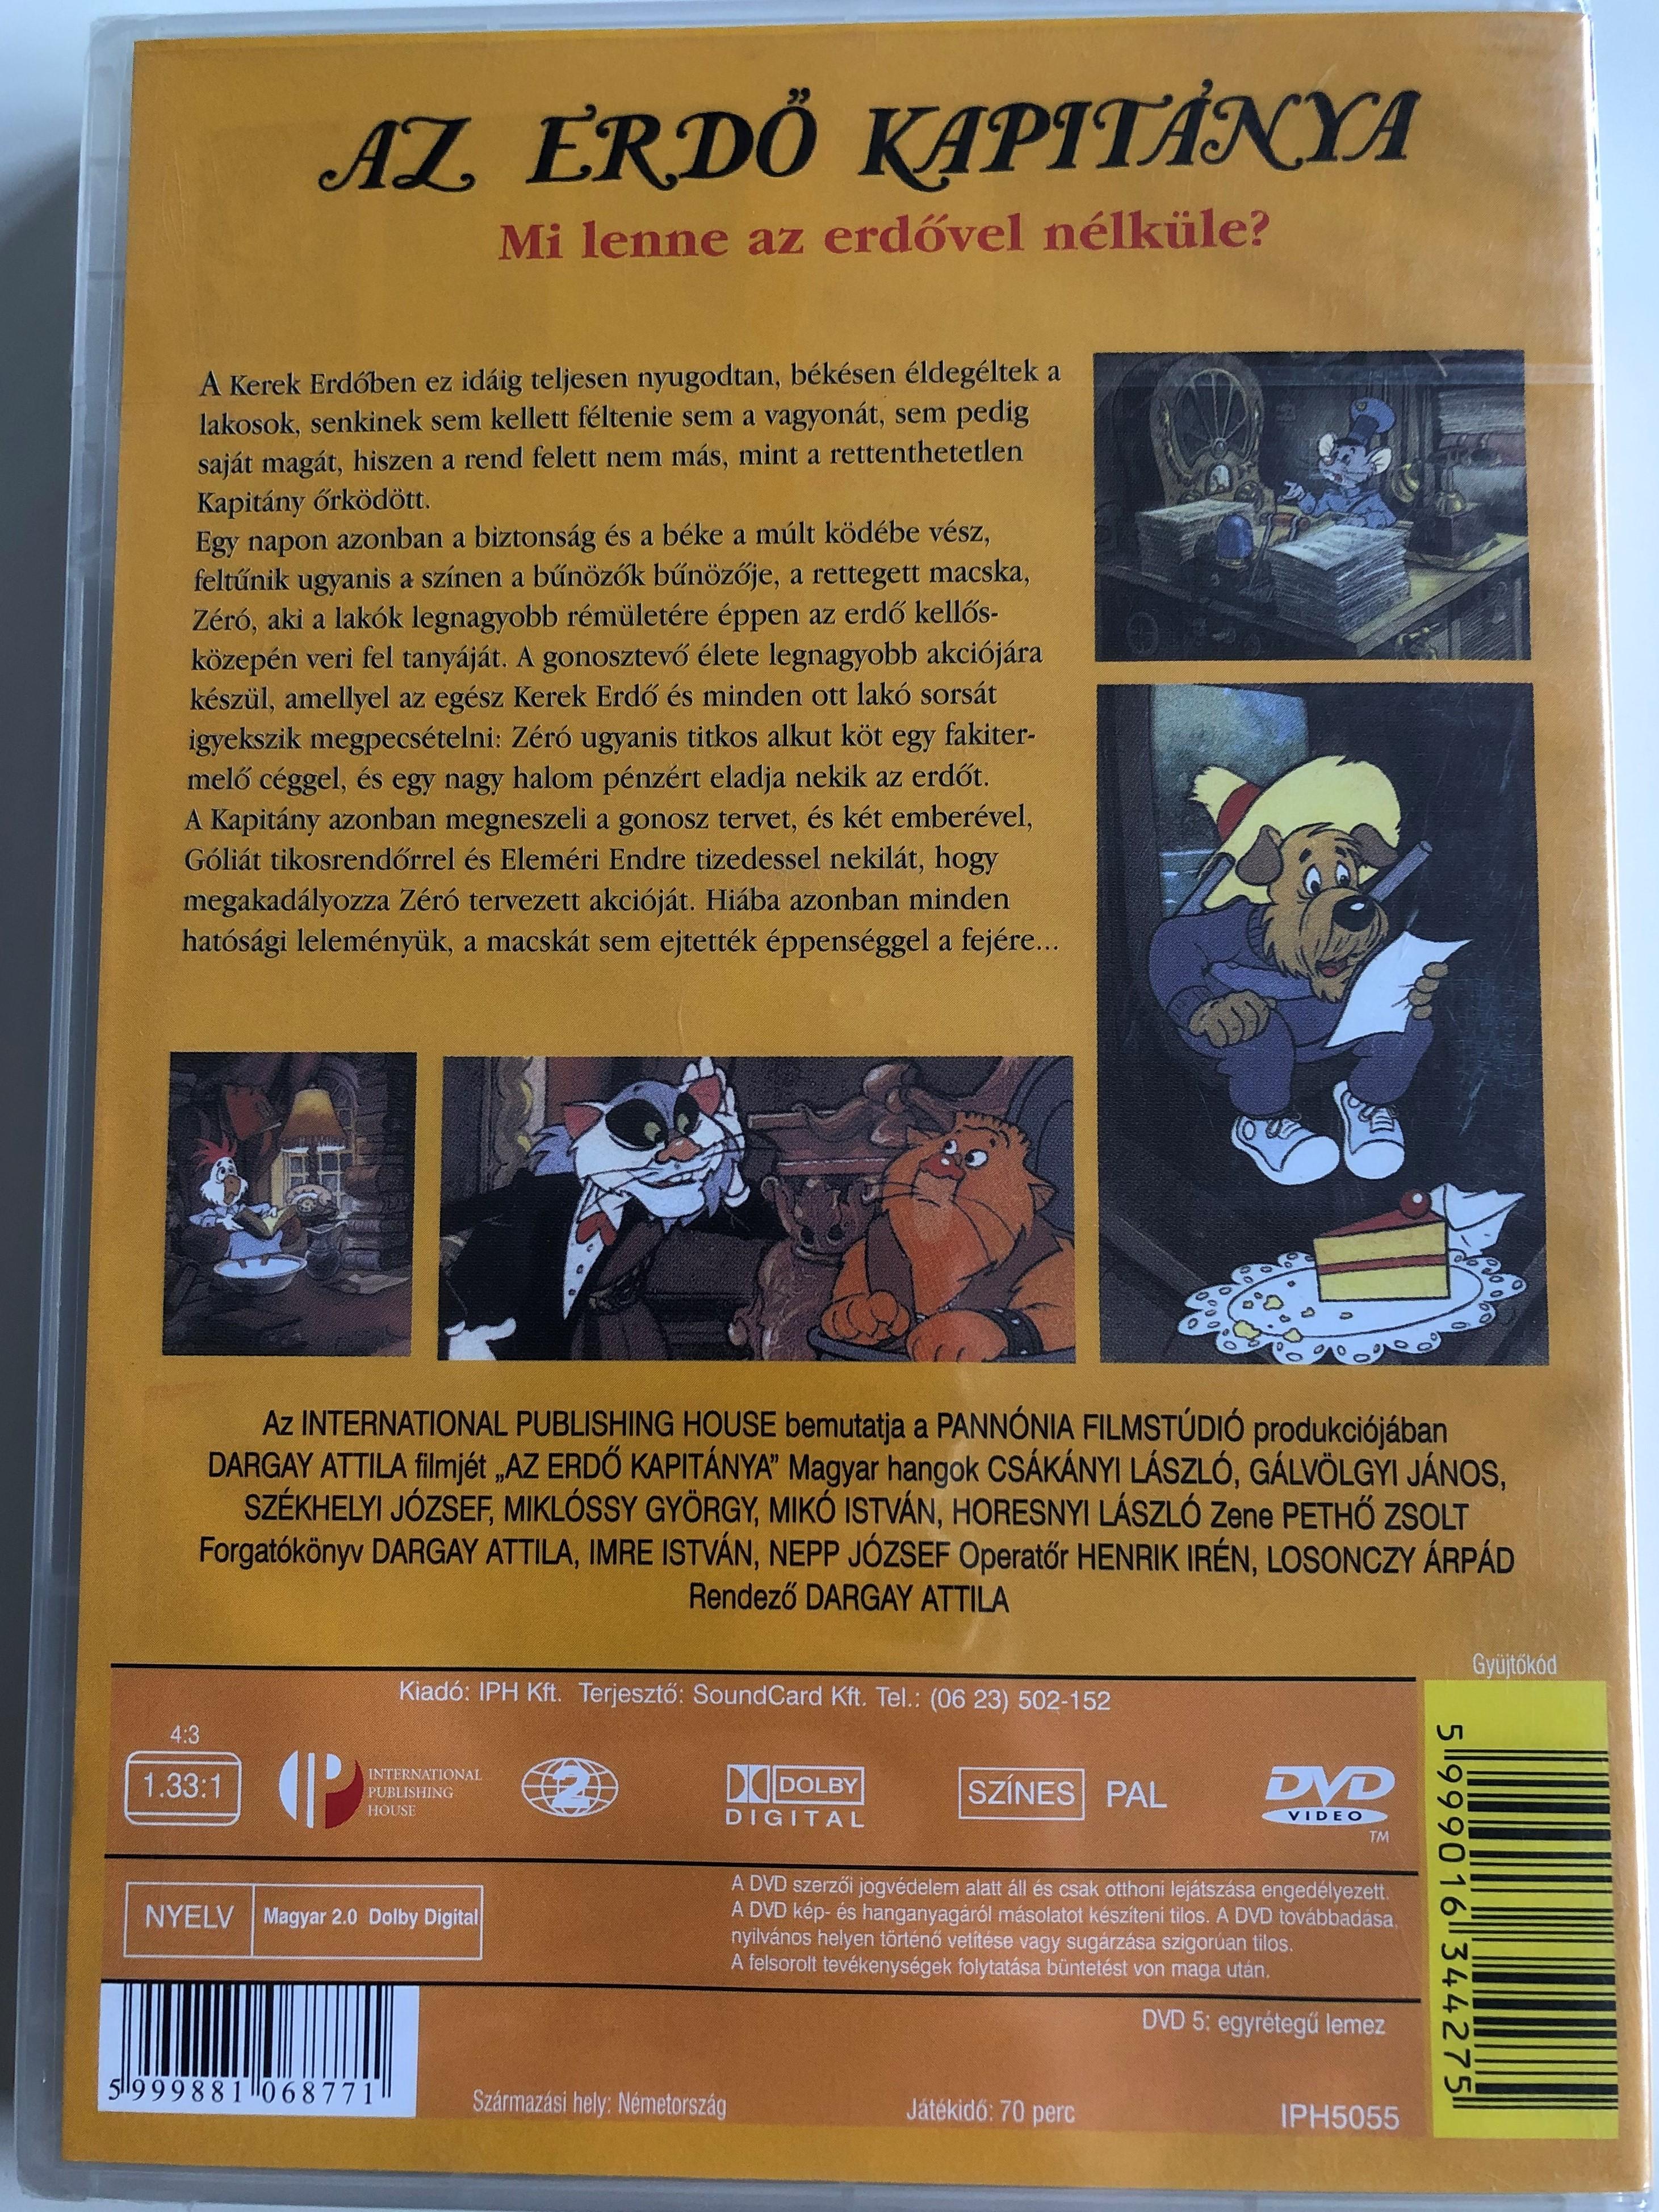 az-erd-kapit-nya-dvd-1988-directed-by-dargay-attila-2.jpg